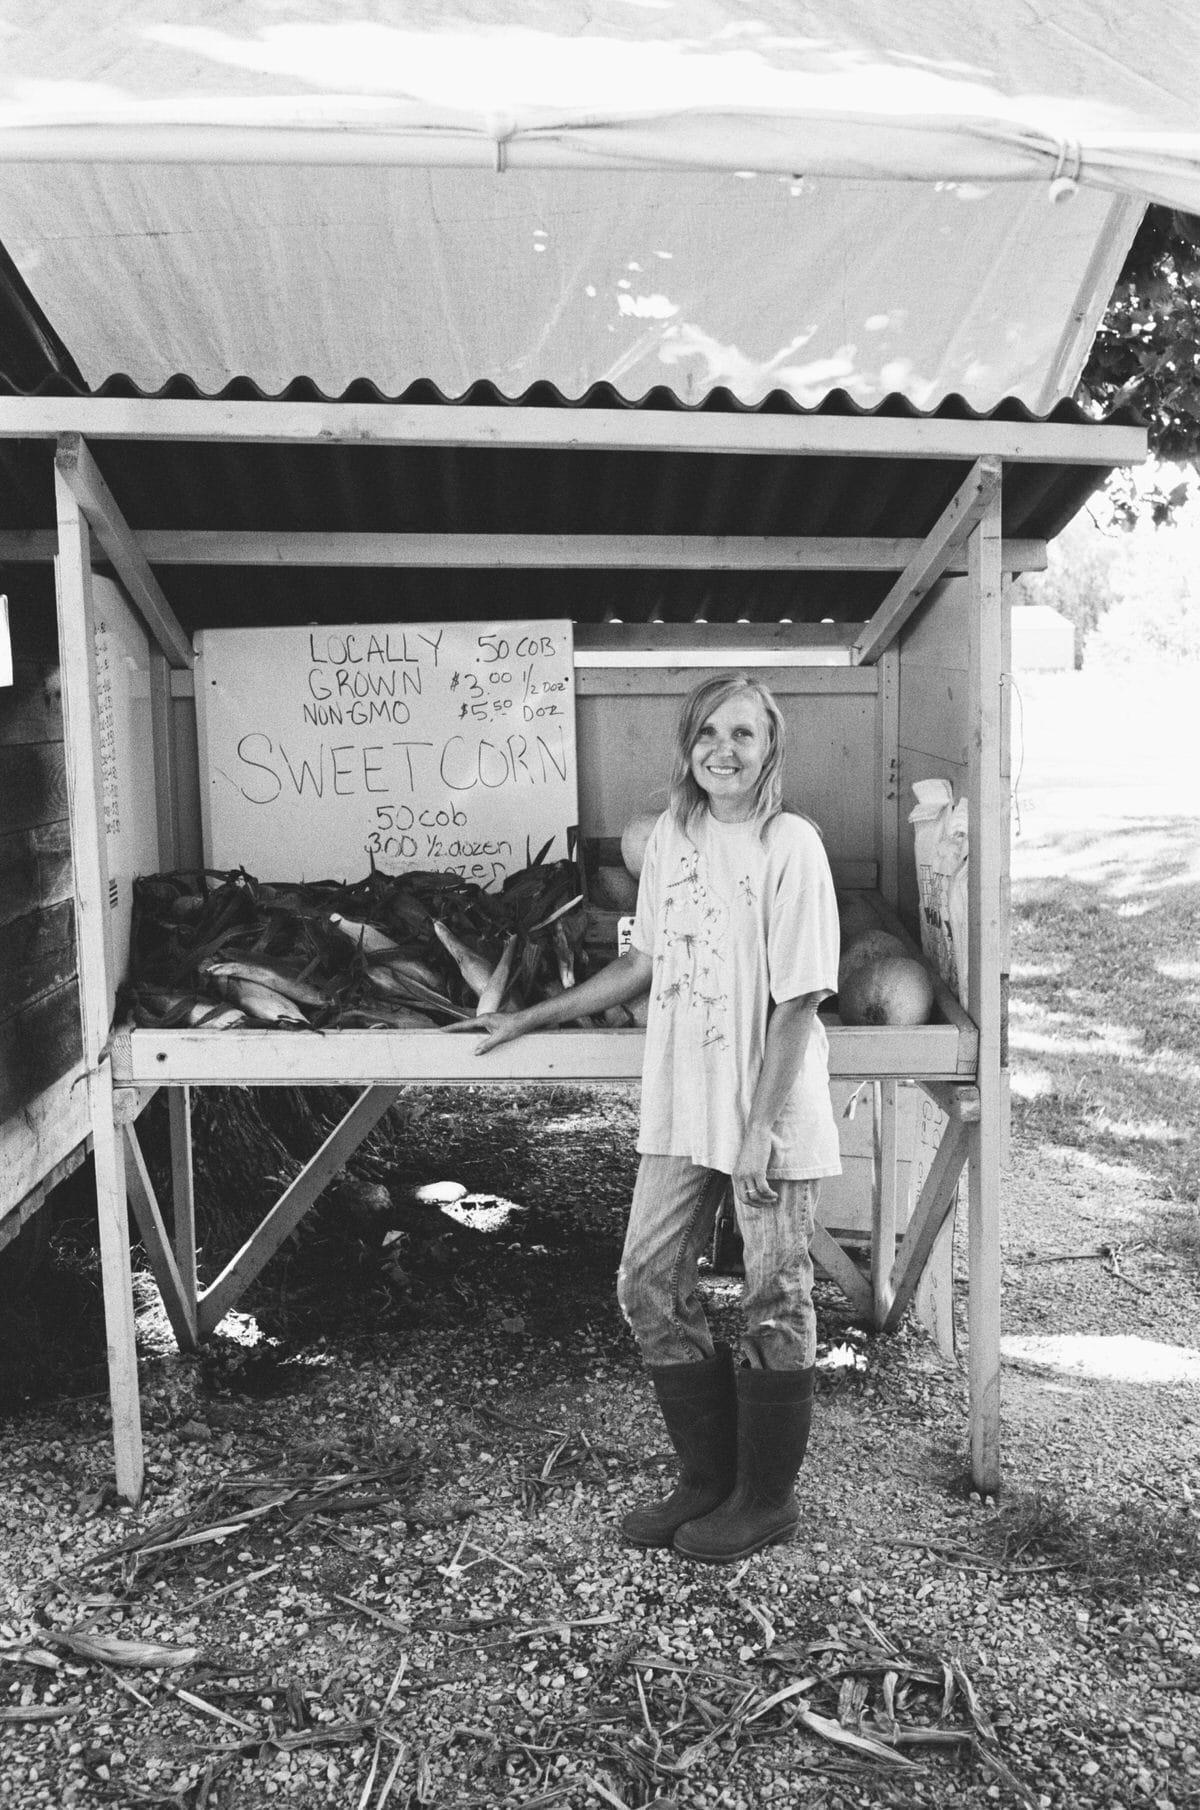 Illuminating-women_exhibition-black-and-white-fine-art-film-photography-of-Wisconsin-farmer-Colleen-Lubbert-by-Studio-L-photographer-Laura-Schneider-_017